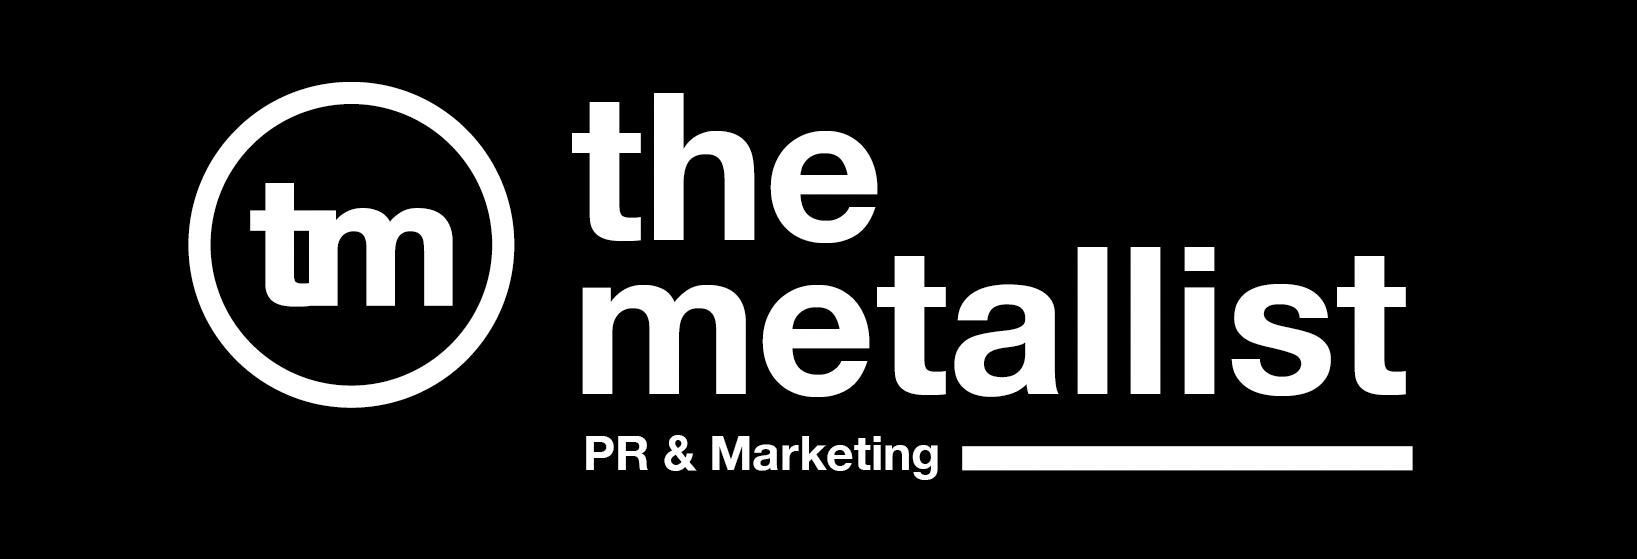 Metallist PR